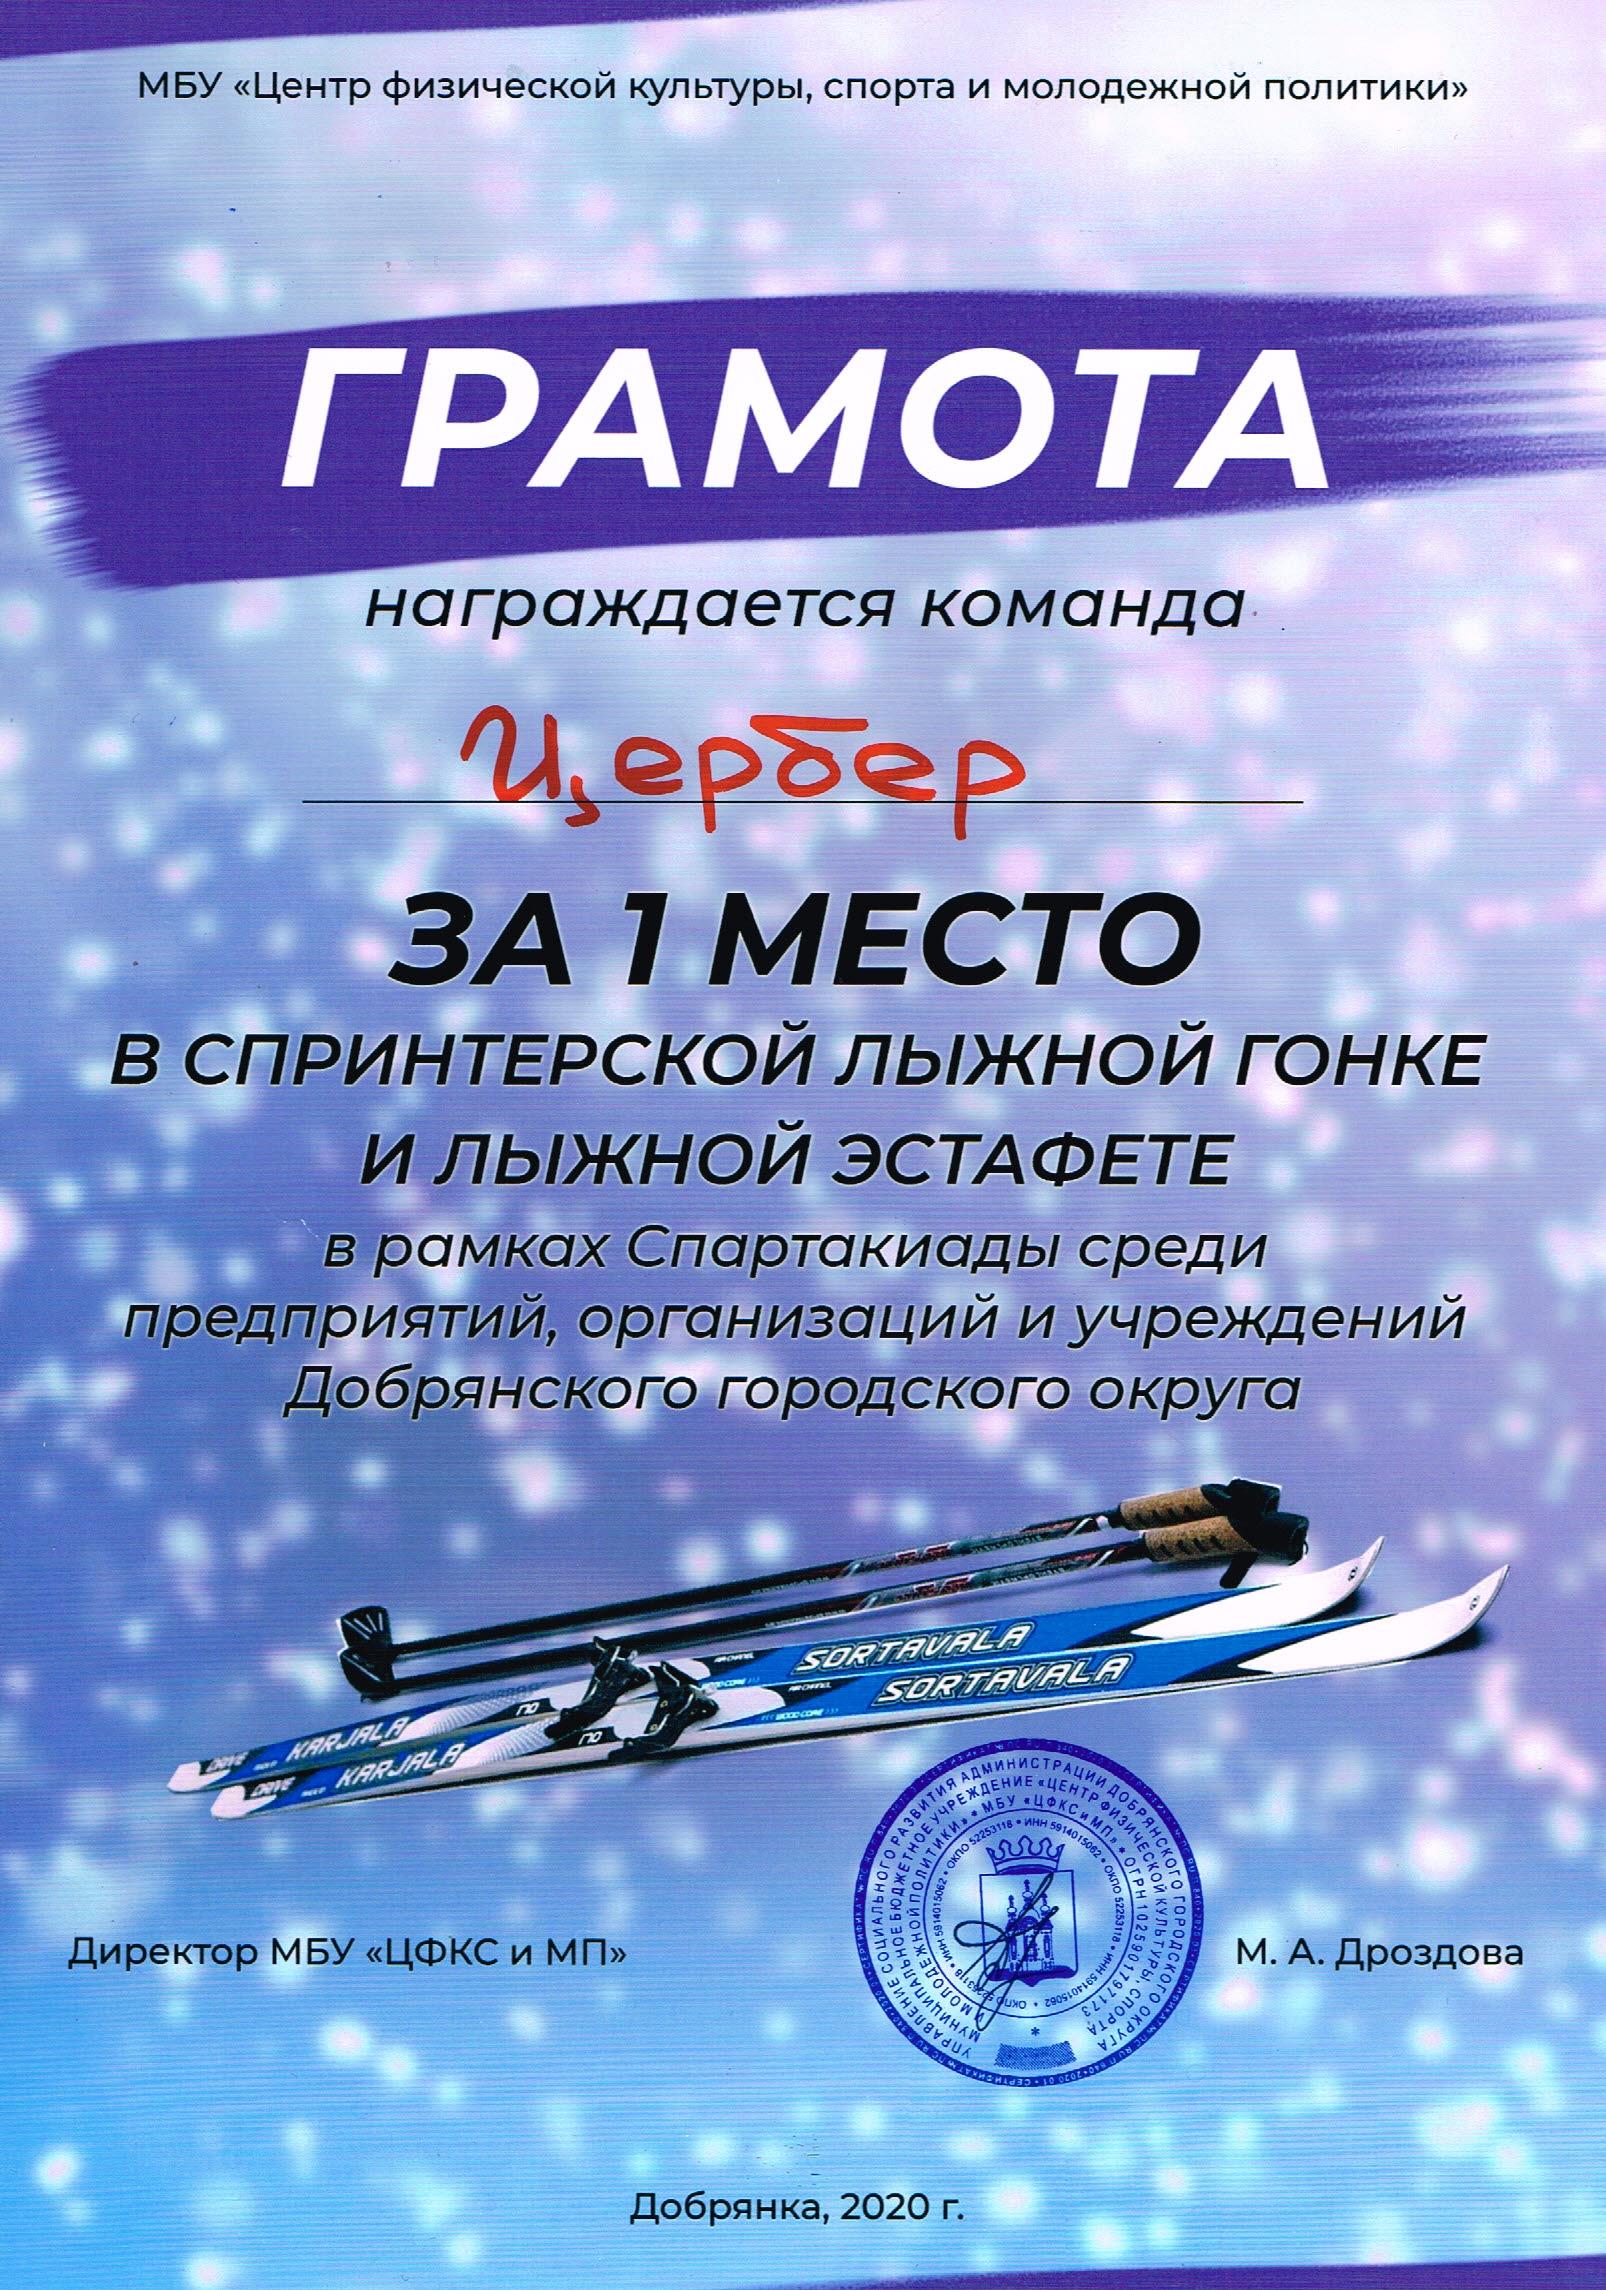 Грамота за 1 место в Спартакиаде среди предприятий, организаций и учреждений